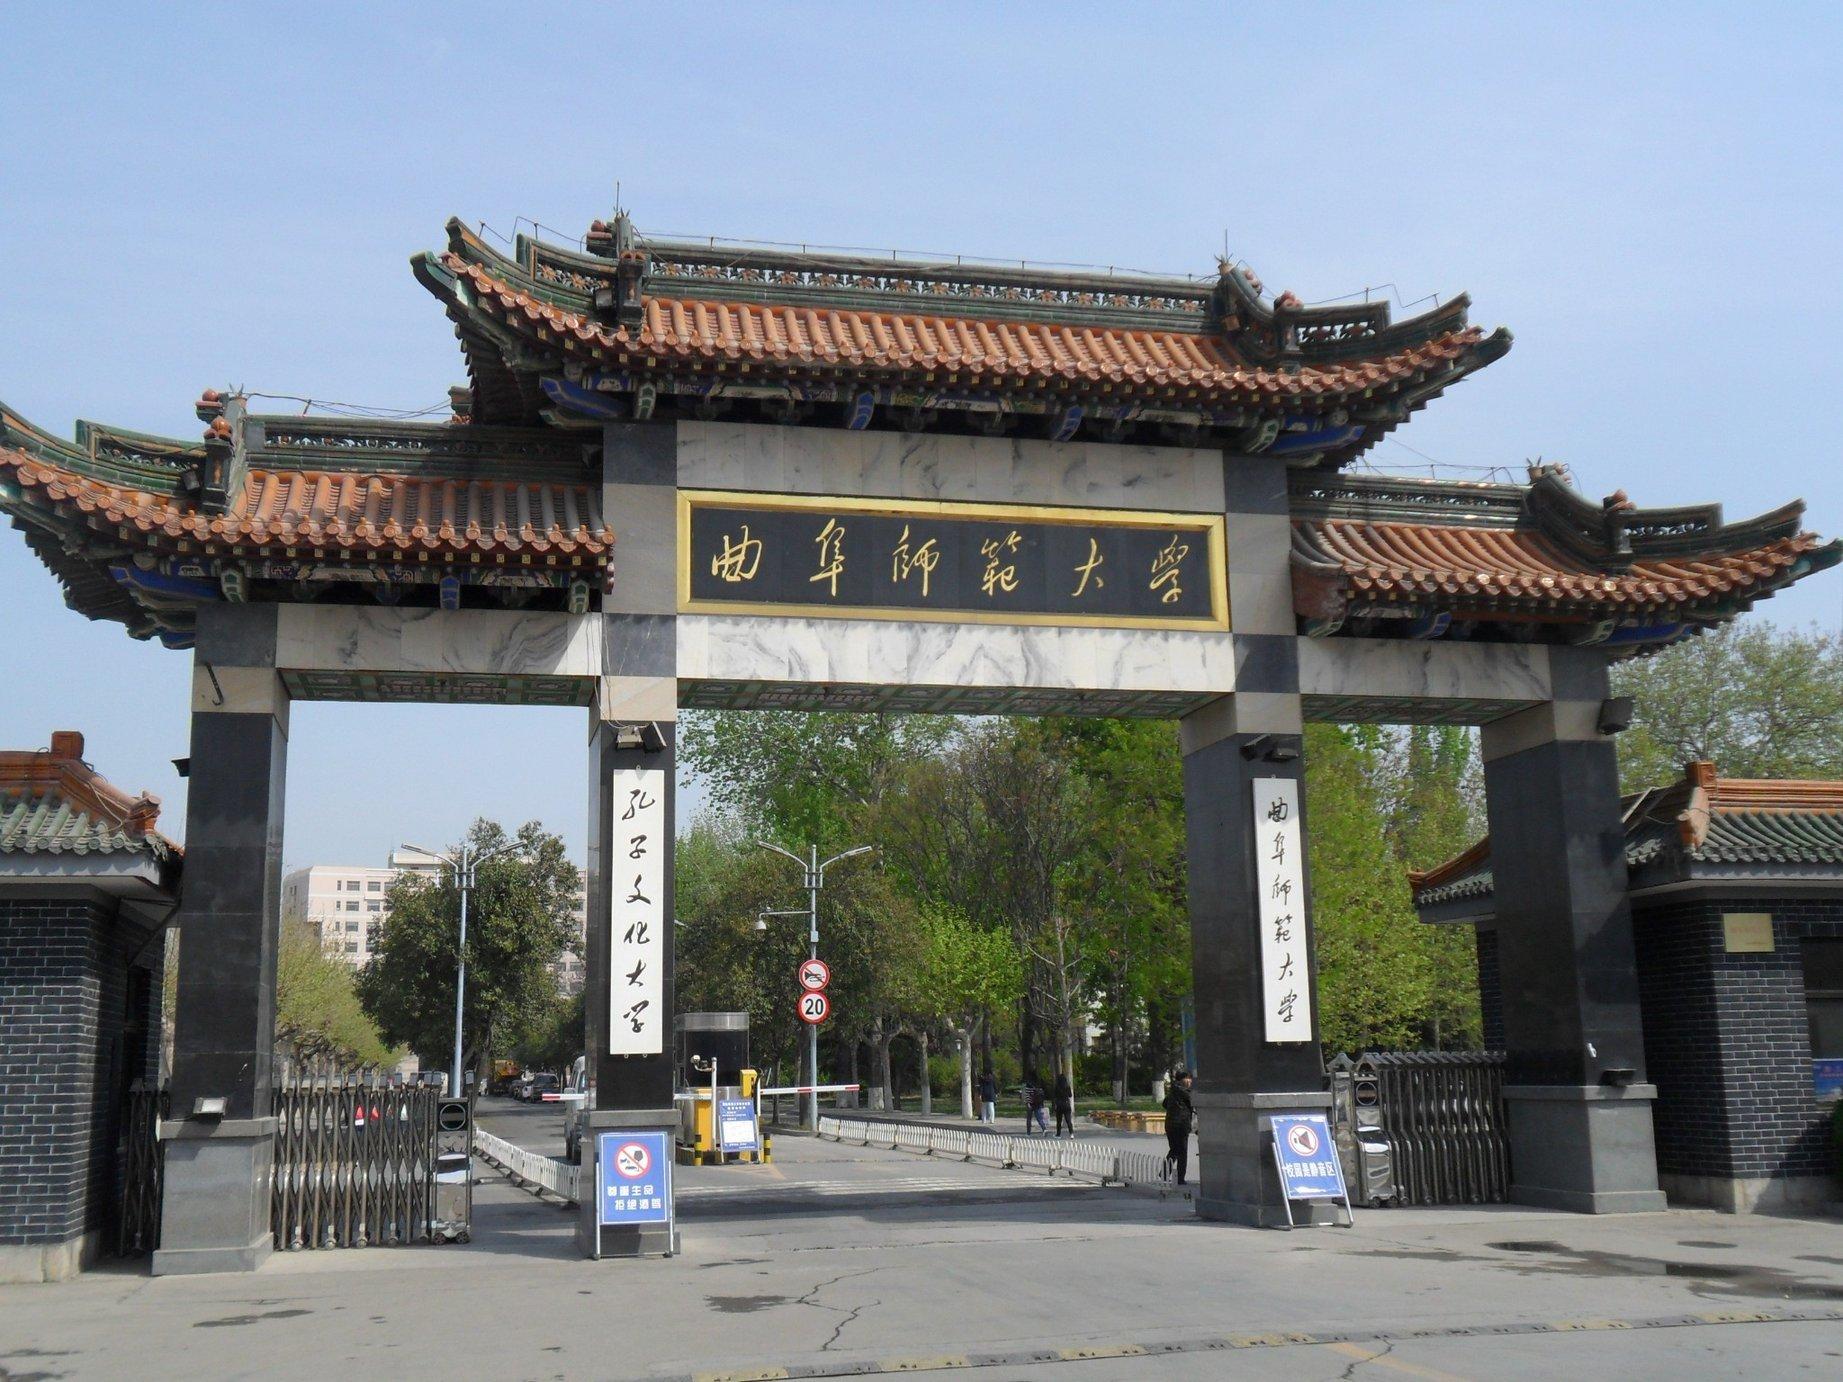 http://www.zgmaimai.cn/jixieshebei/167378.html